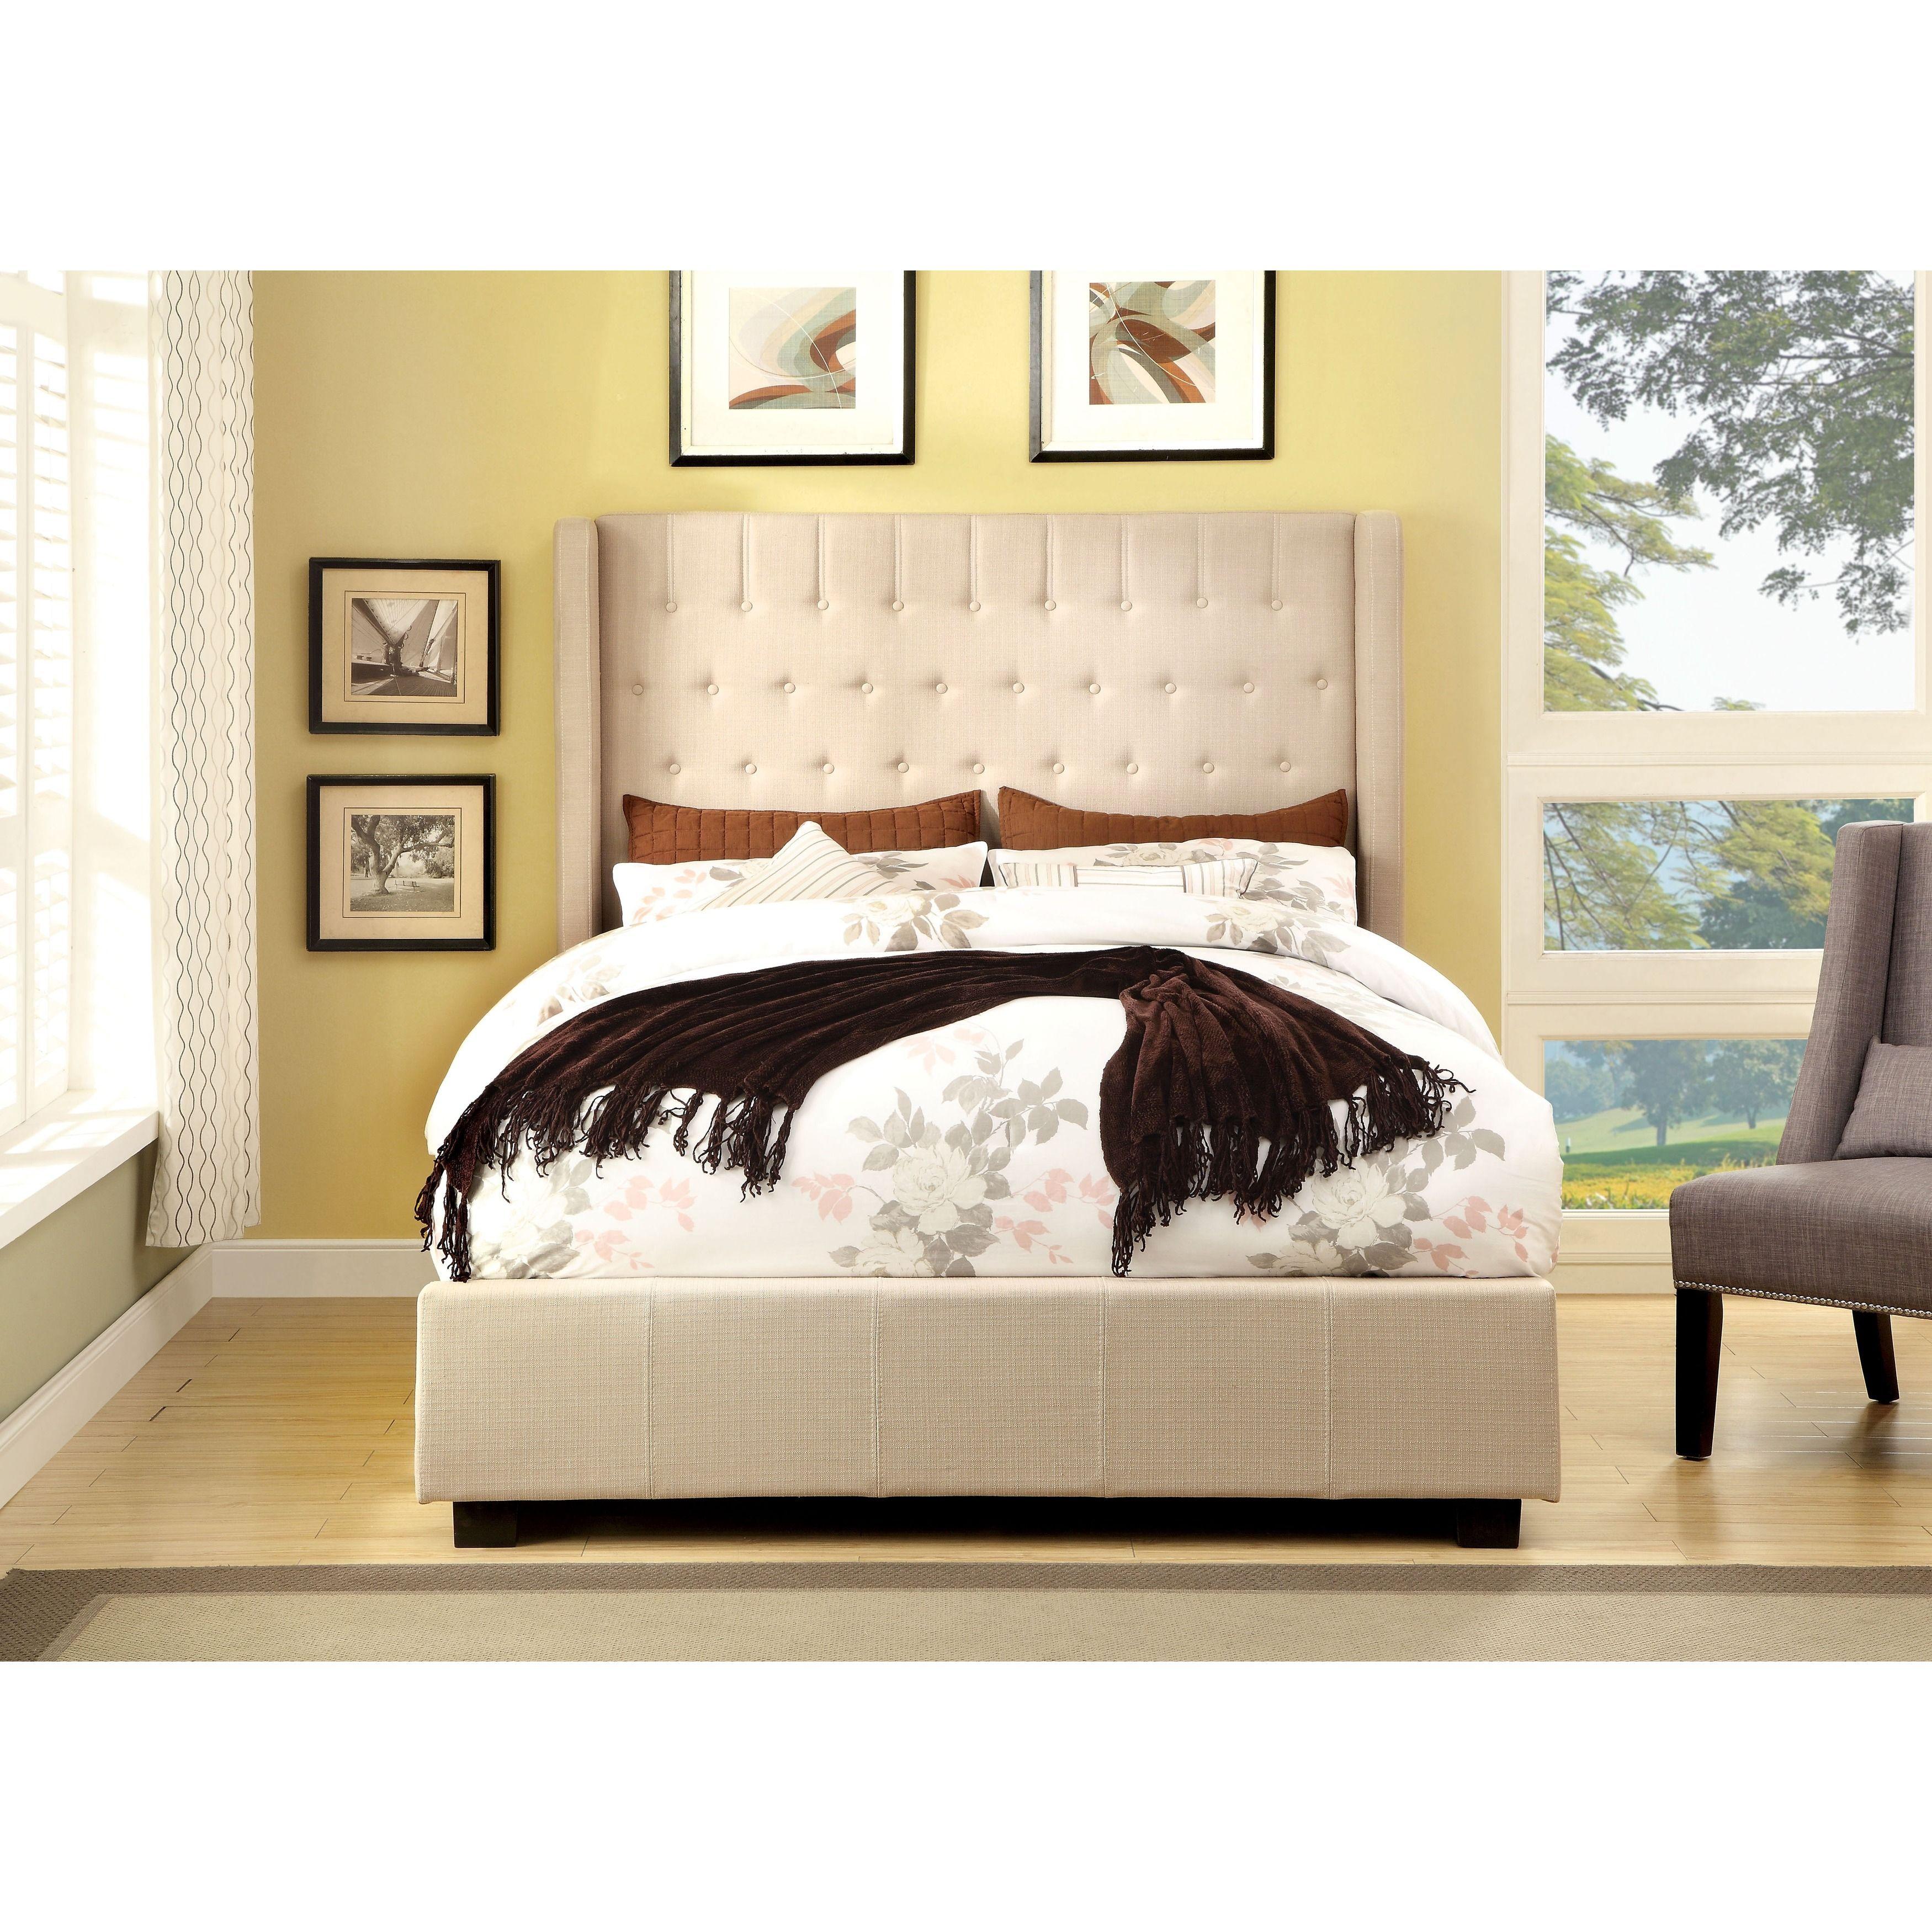 Furniture of America Carmella Wingback Low-profile Bed (Green - Queen)